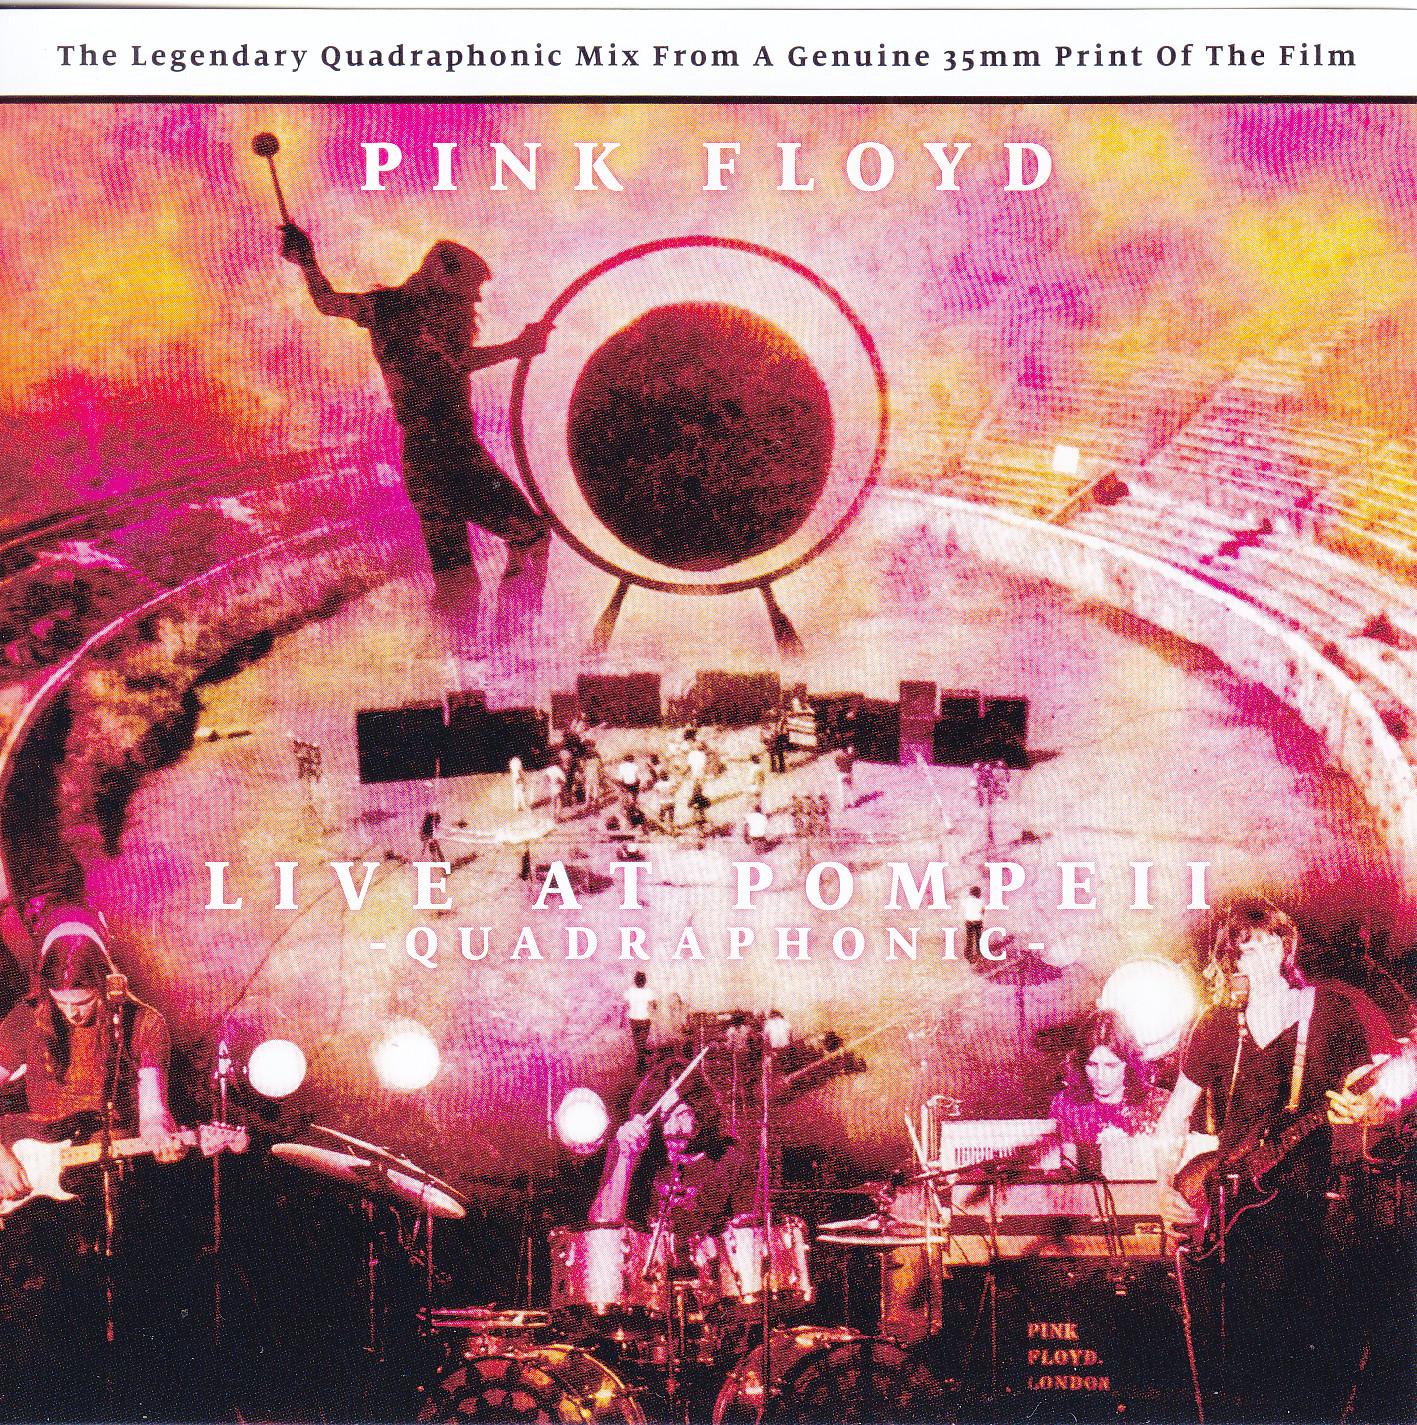 Pink Floyd - Live At Pompeii Quadraphonic (1CD) Sigma 118